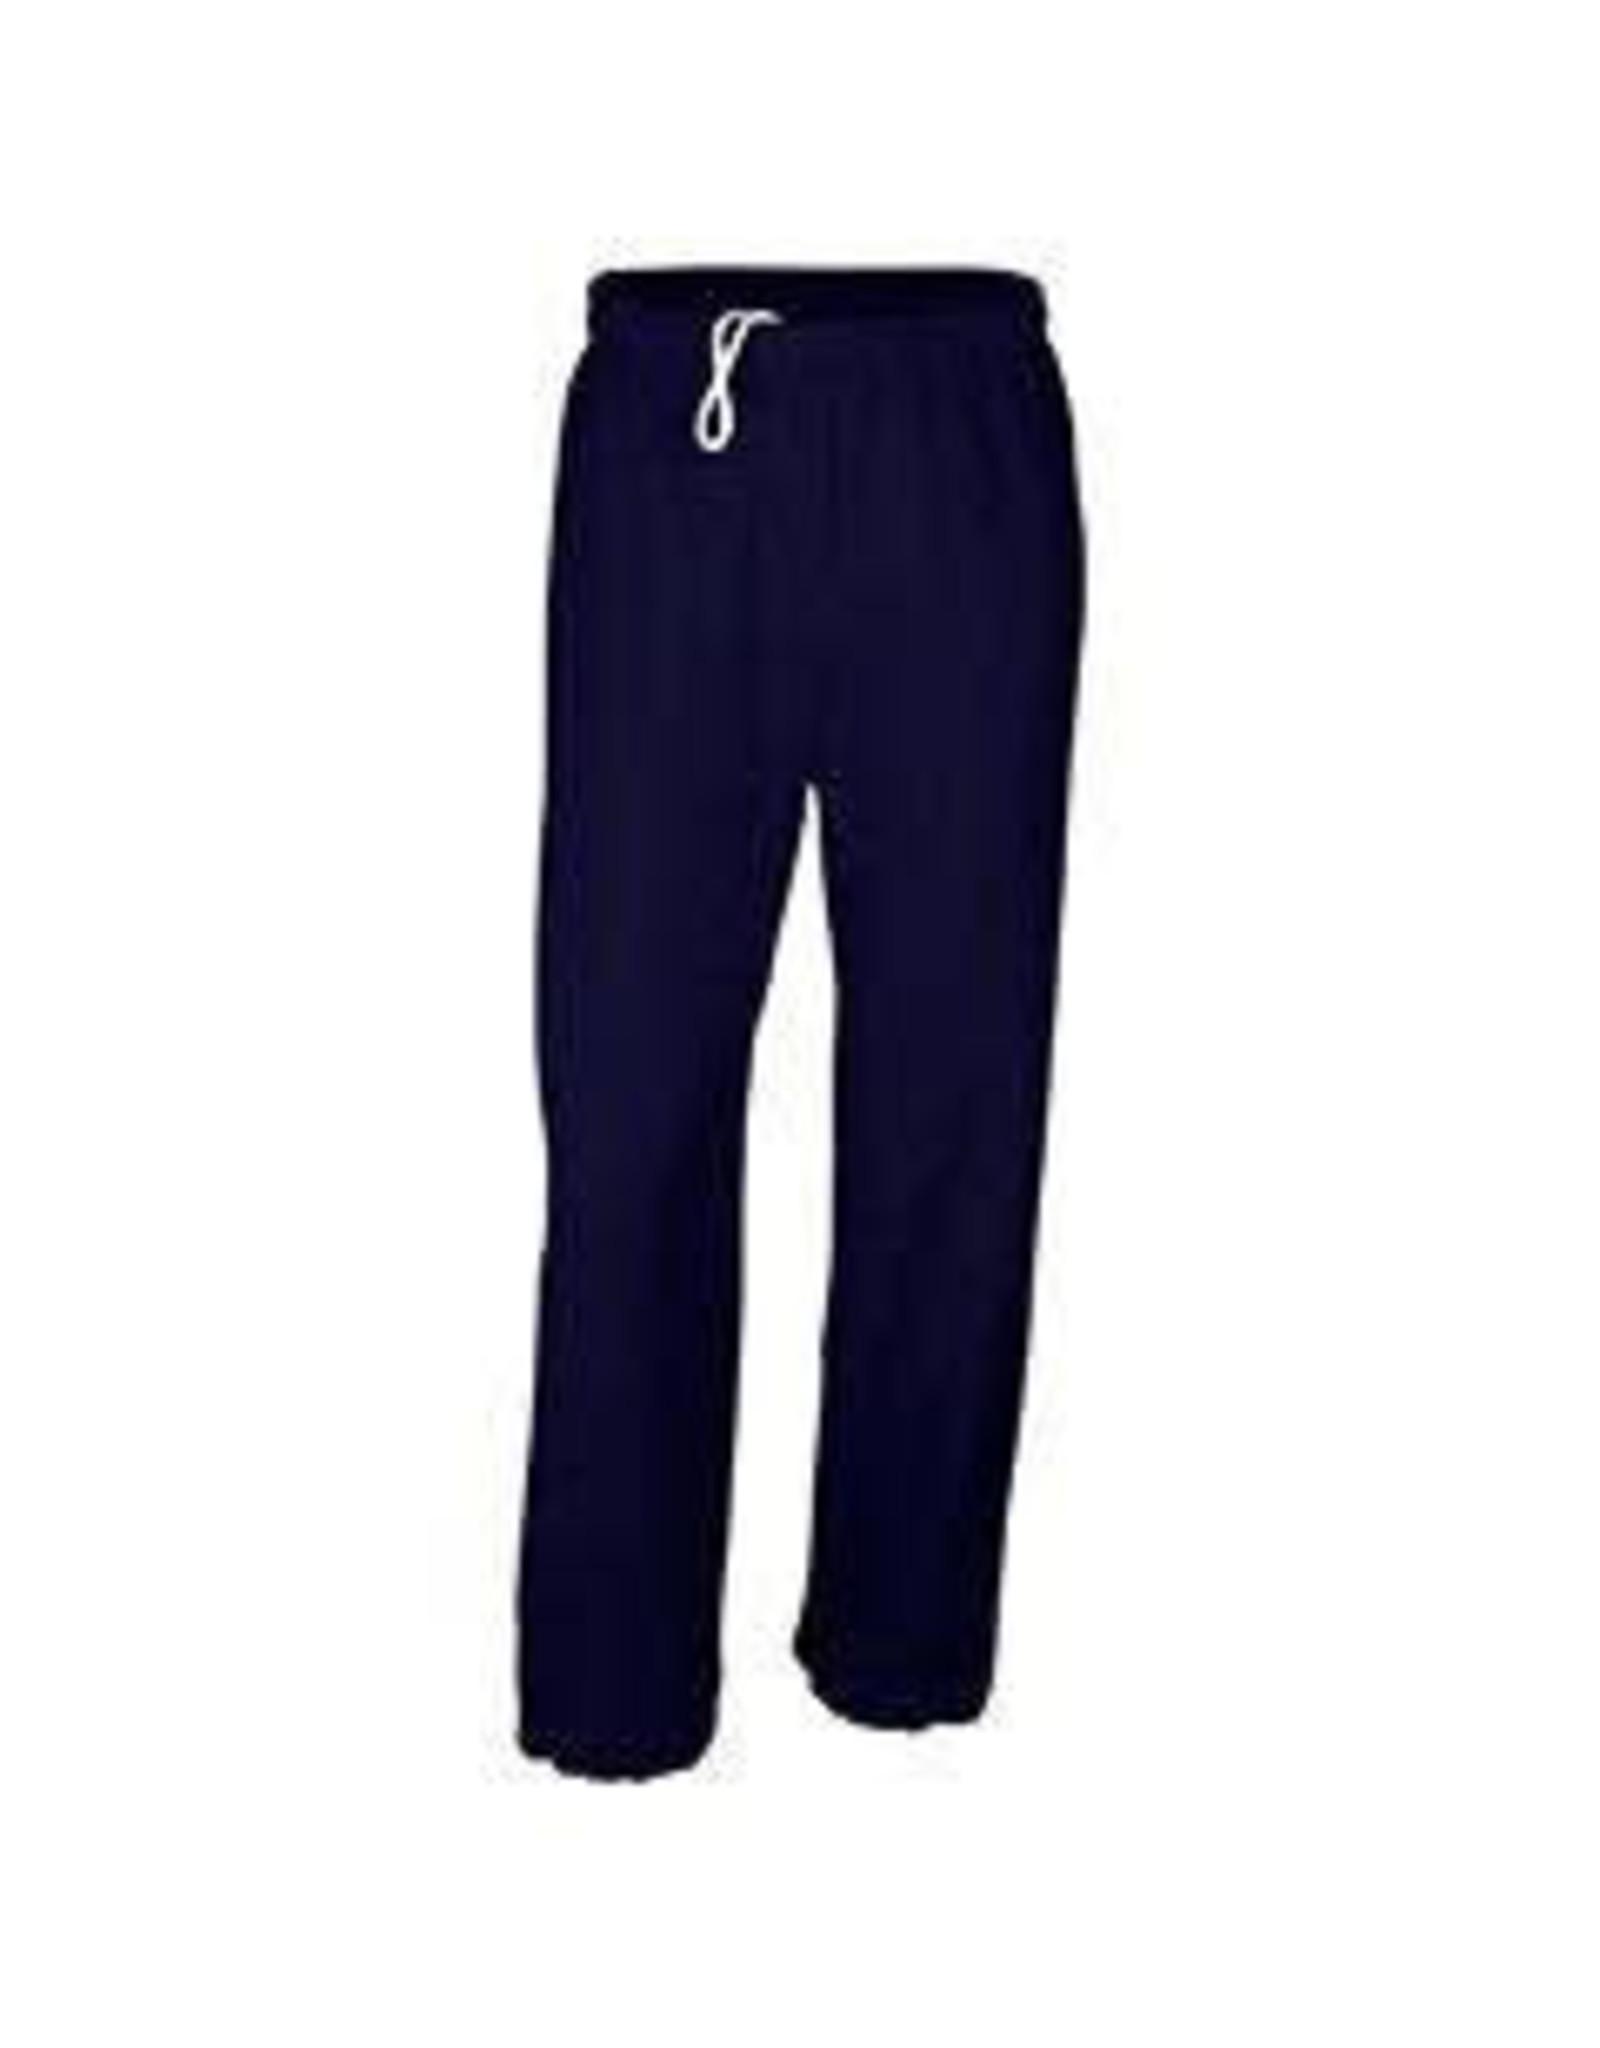 UNIFORM Gym Pant - Gym Sweatpants, Youth & Adult